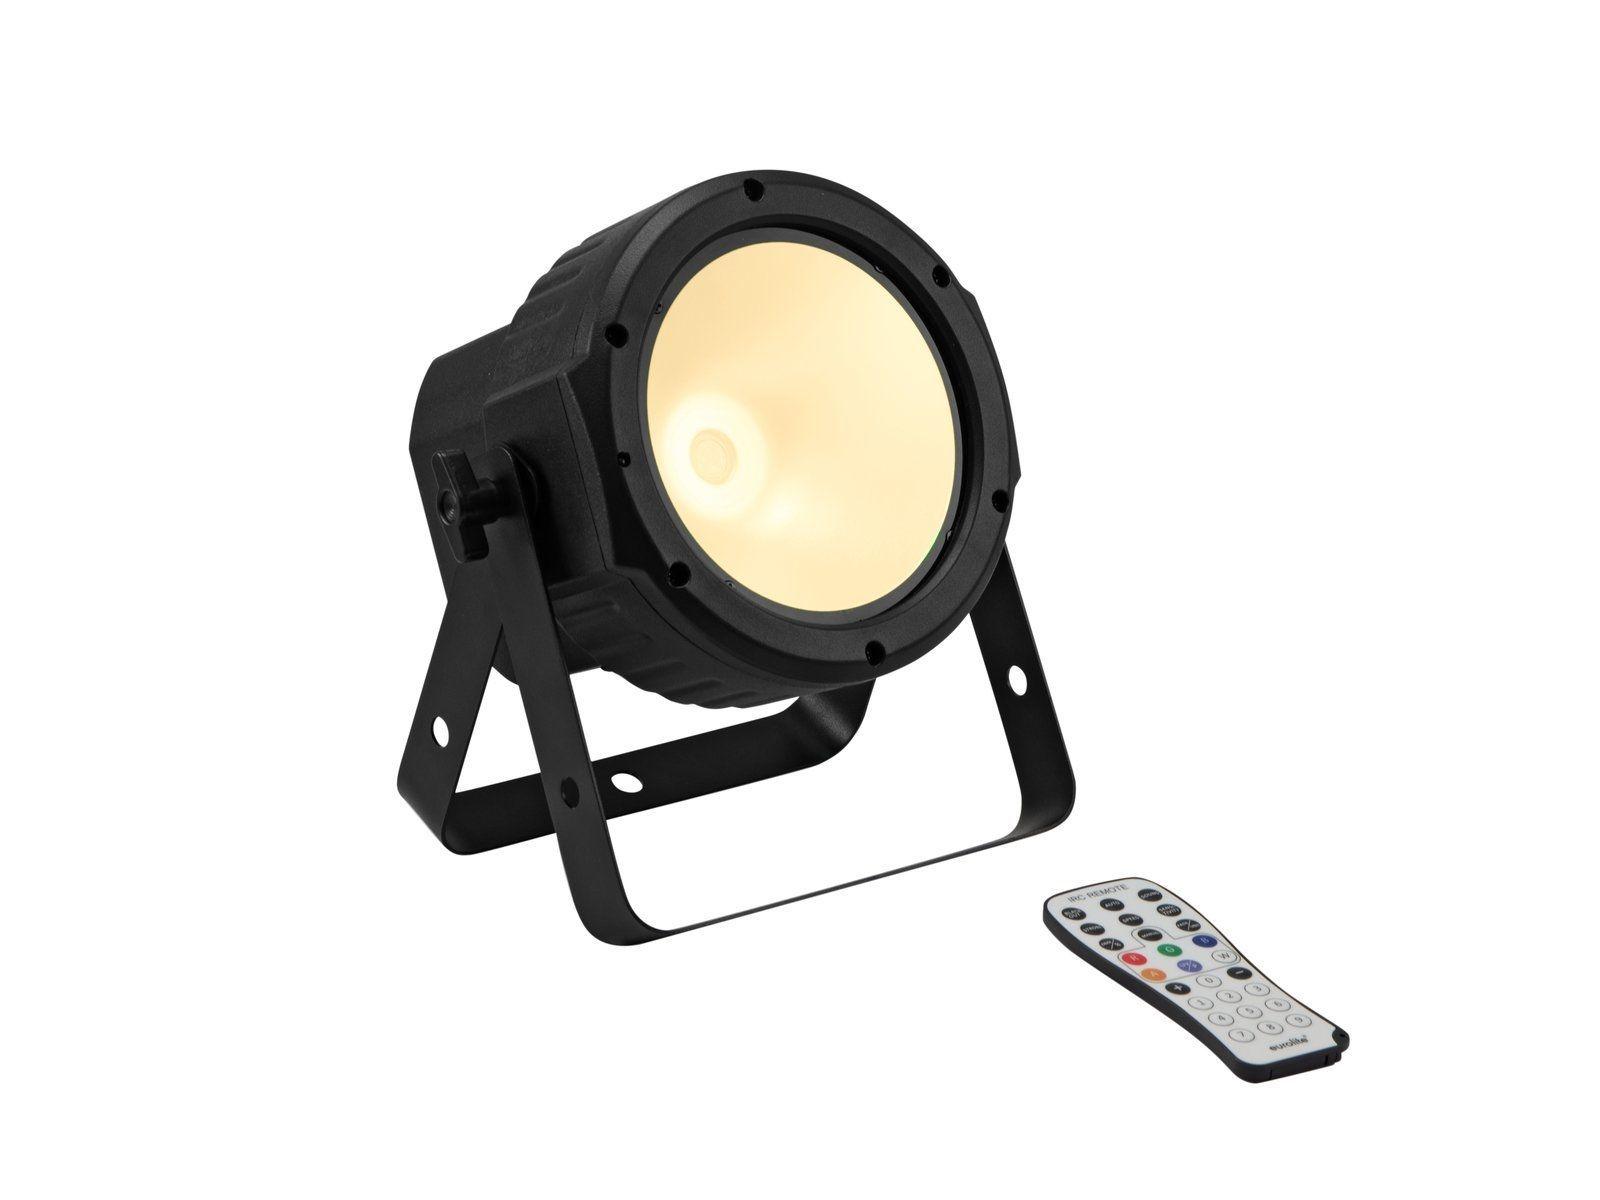 EUROLITE LED SLS-30 COB WW Floor LED Scheinwerfer mit 1x 30W COB-LED in WW